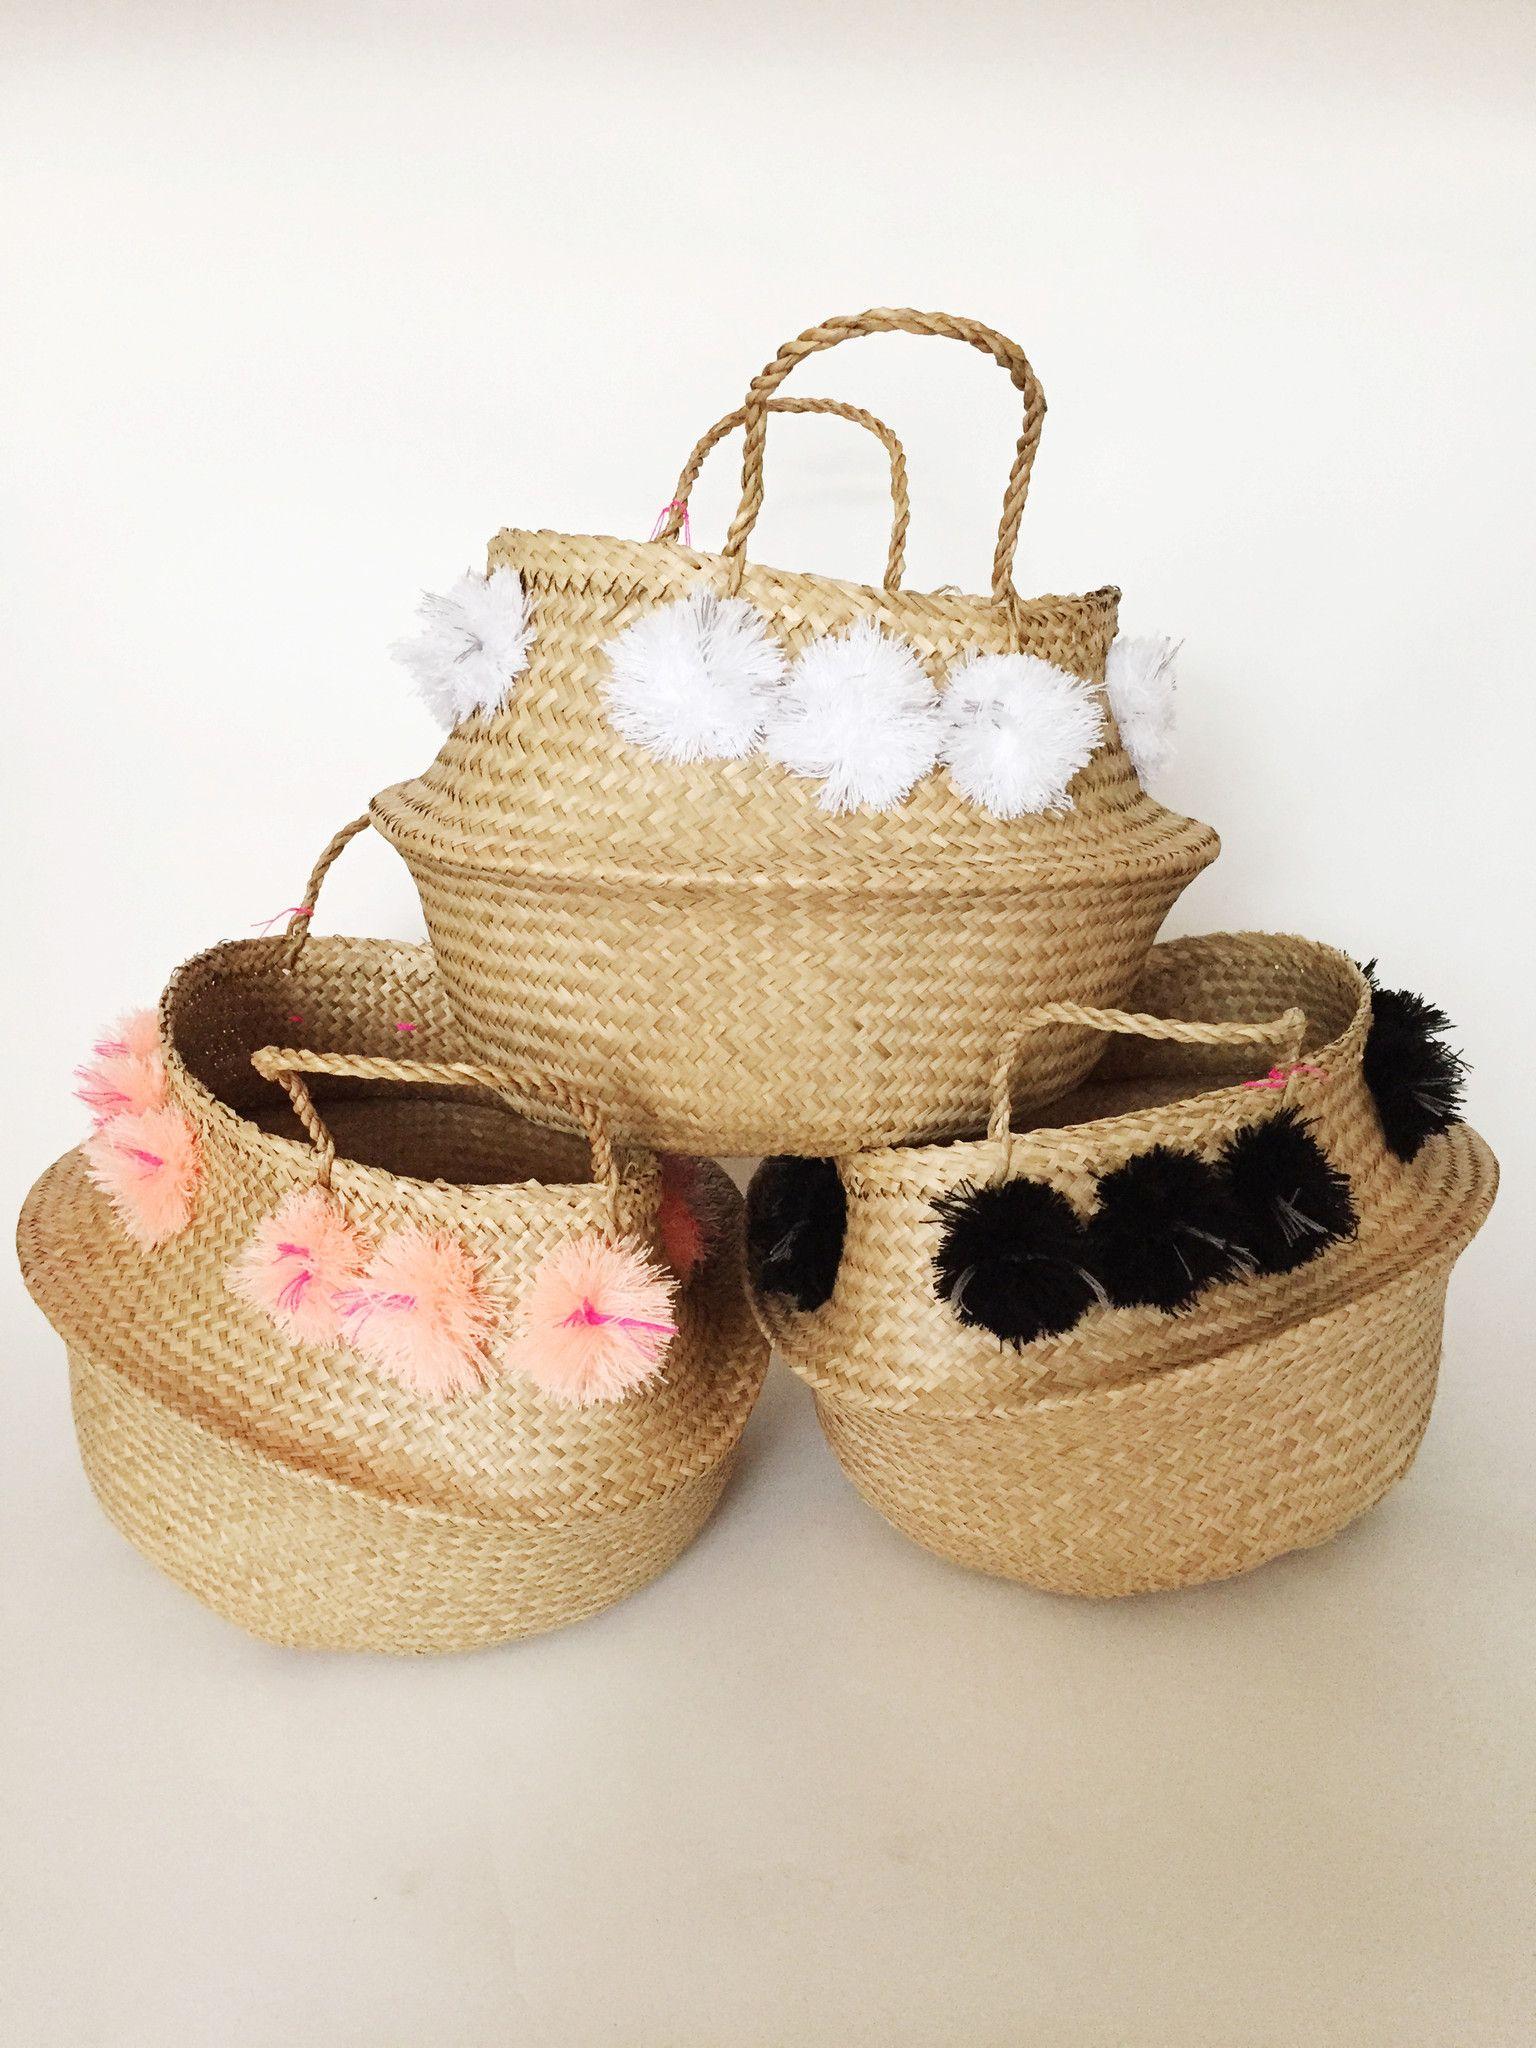 Eliza Gran Pom Pom Basket - Large | Wish List | Pinterest | Körbchen